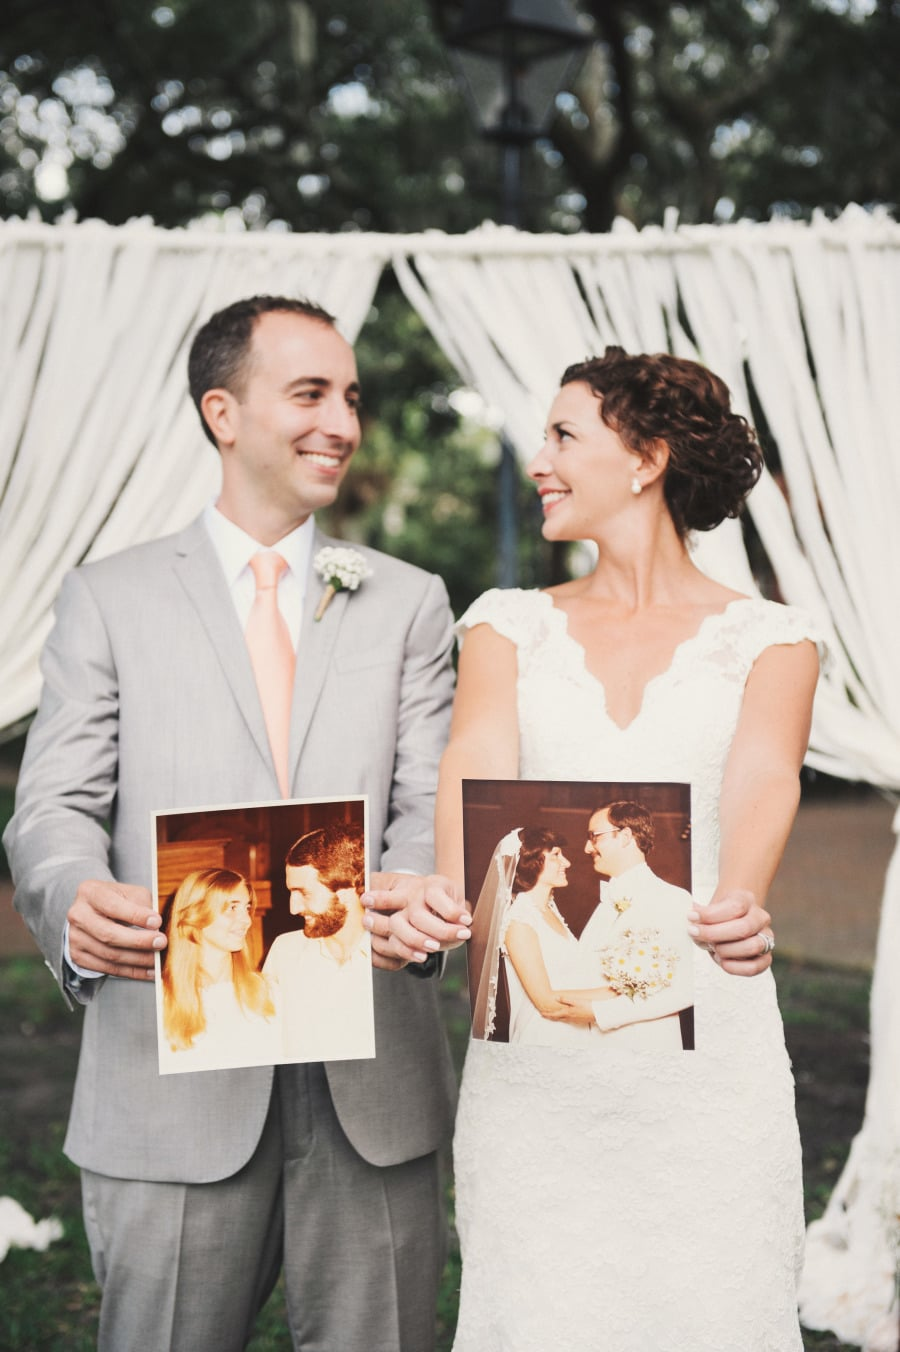 Holding Parents' Photos